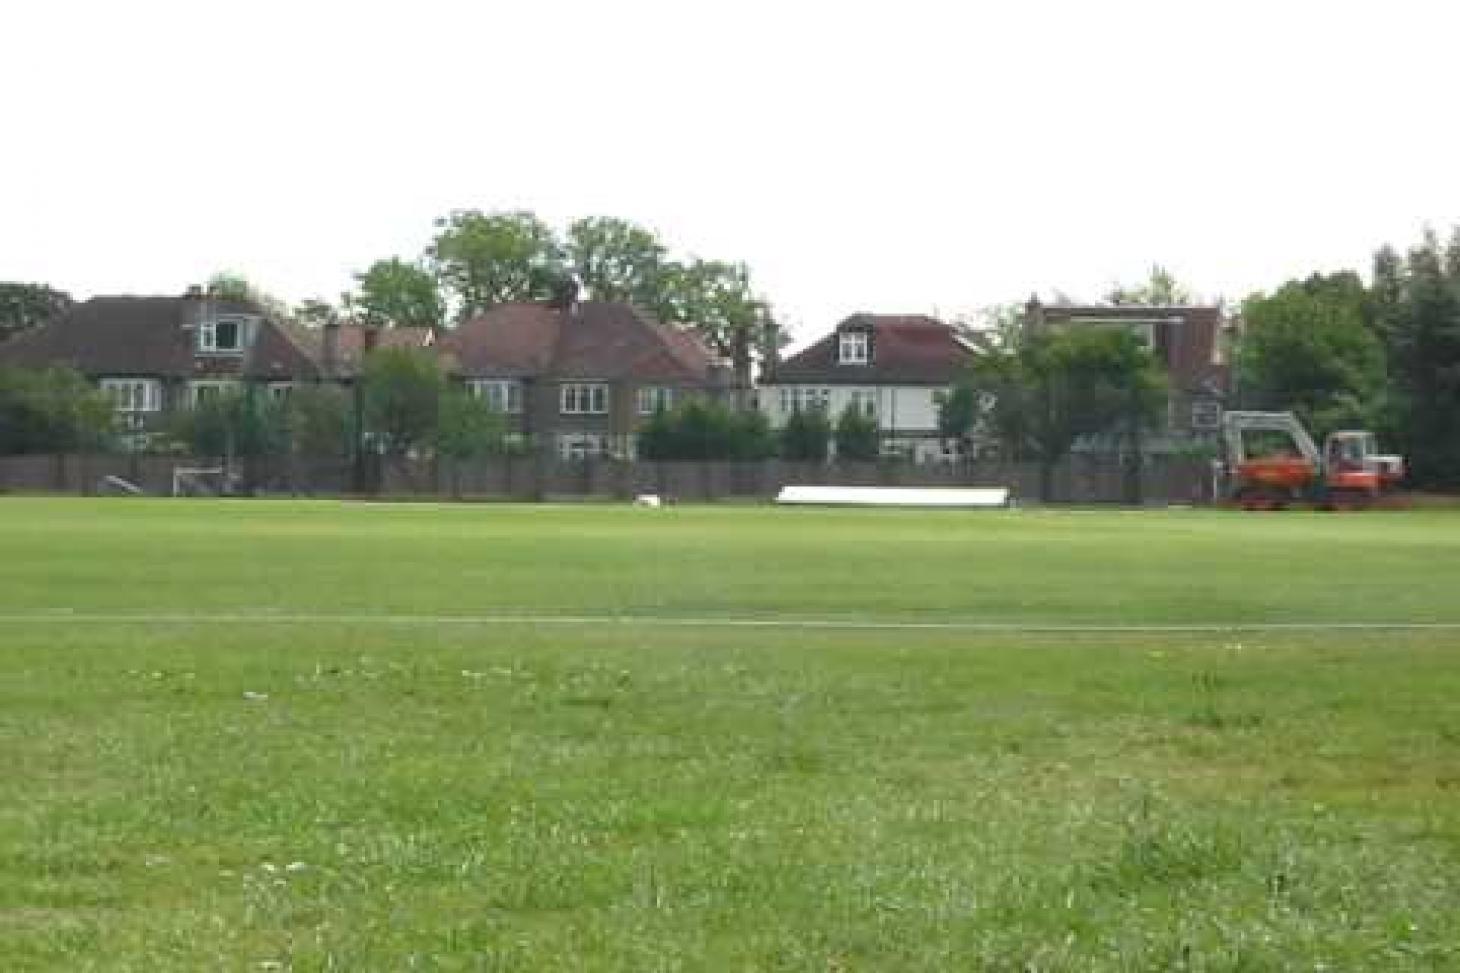 Wilf Slack Memorial Ground Nets | Artificial cricket facilities